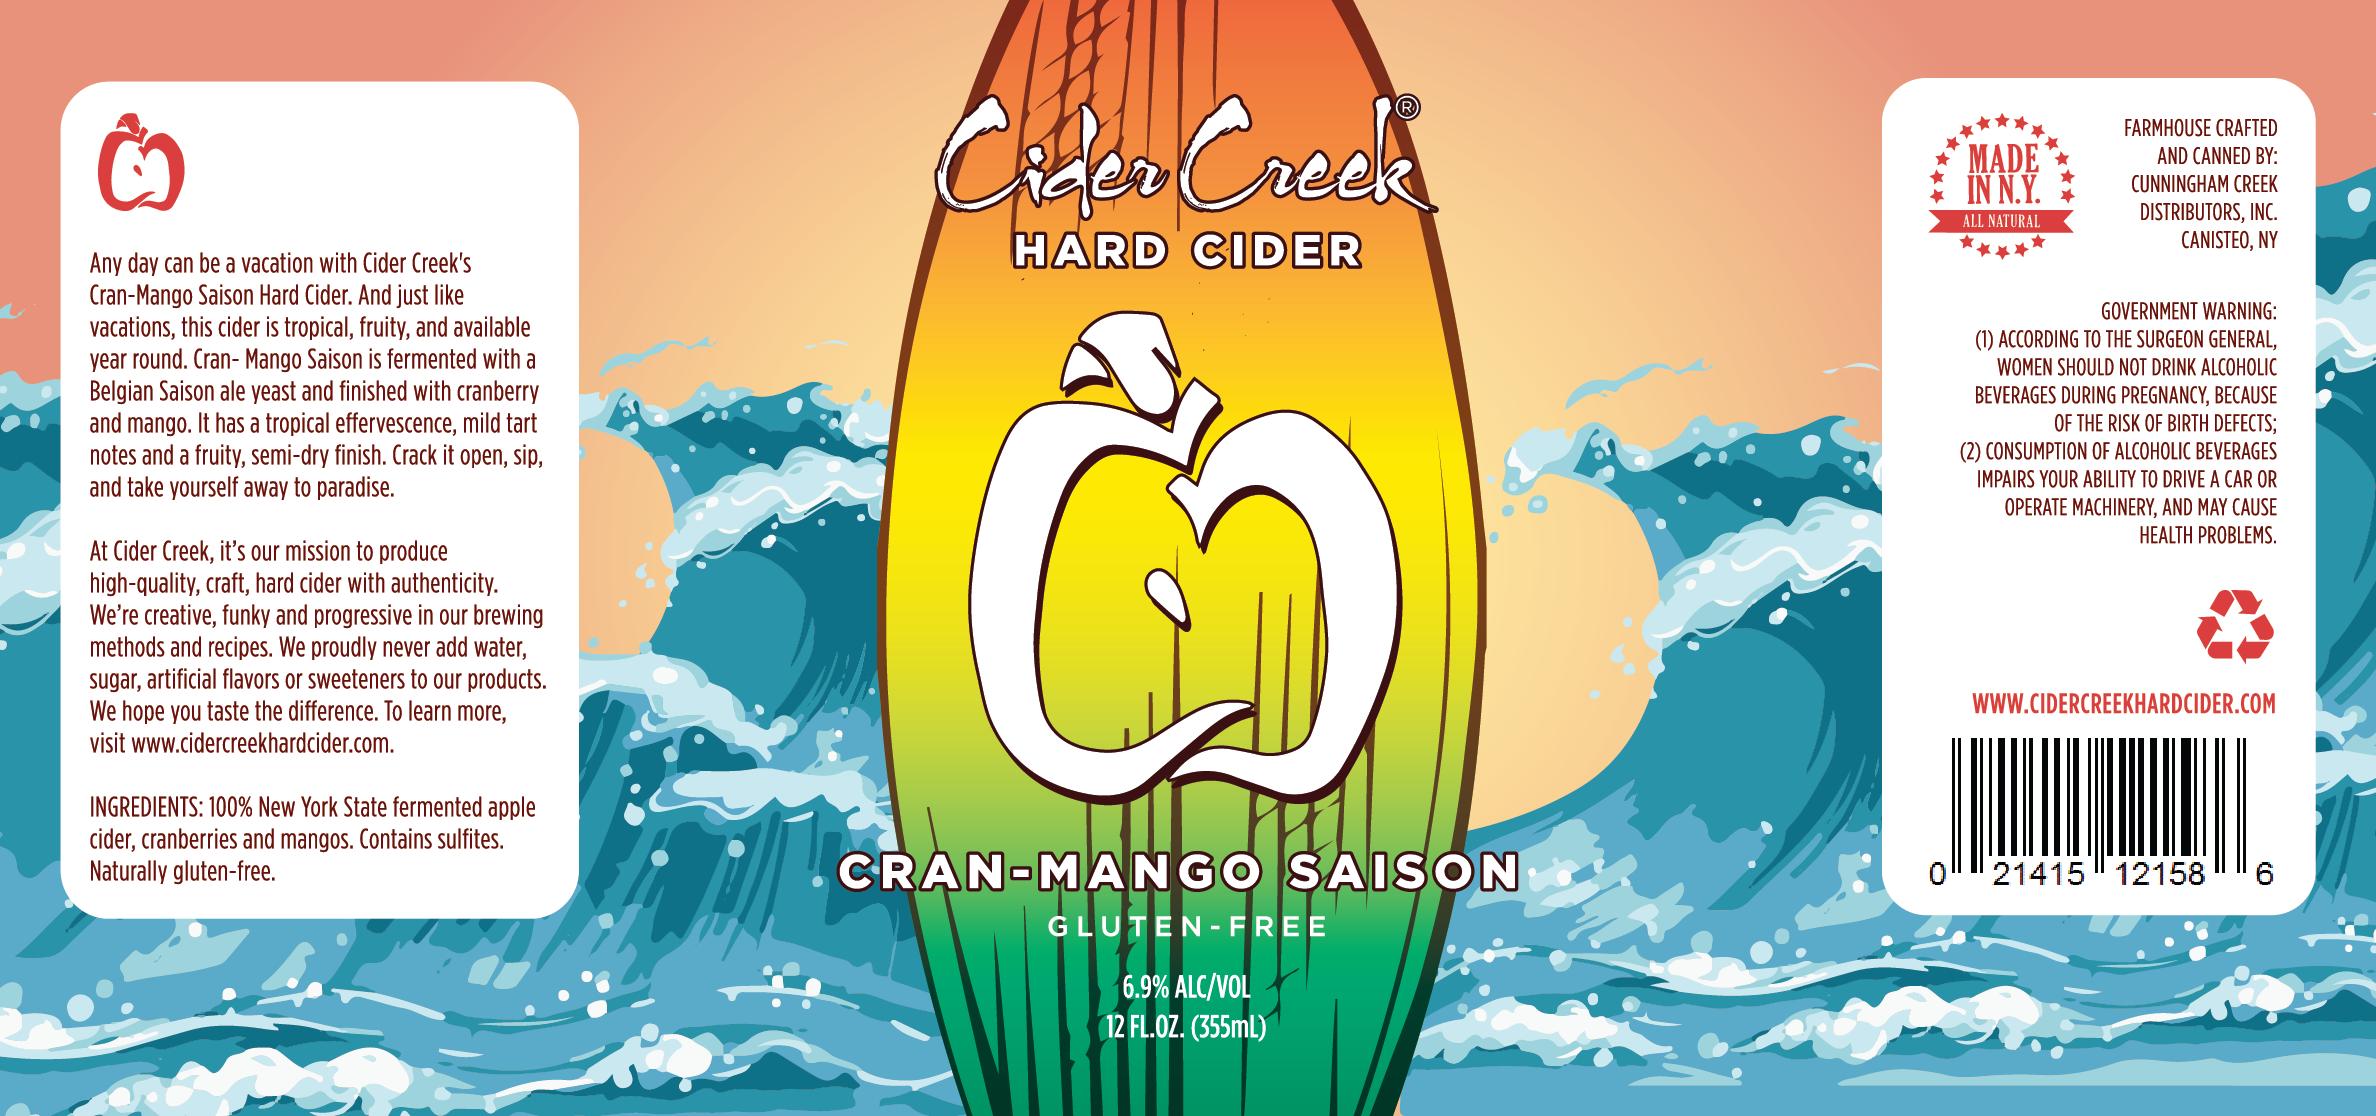 Cider Creek Hard Cider Cran Mango Saison Label